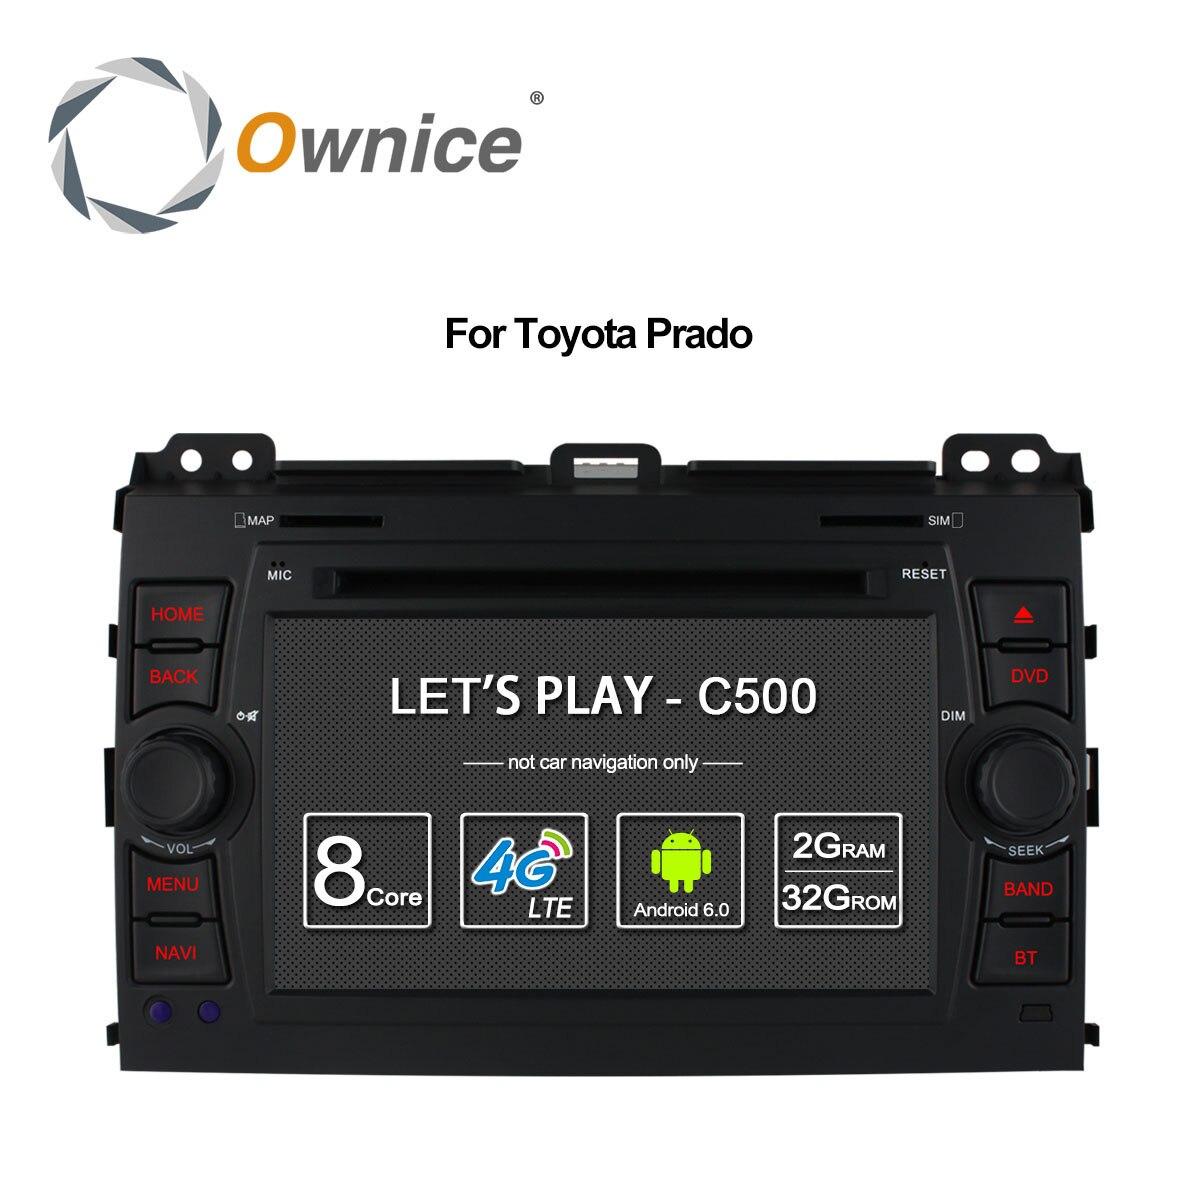 Ownice C500 4 г LTE SIM Octa 8 core Android 6.0 dvd-плеер автомобиля для Toyota Land Cruiser Prado 120 2002-2009 GPS Navi Радио 32 г Встроенная память